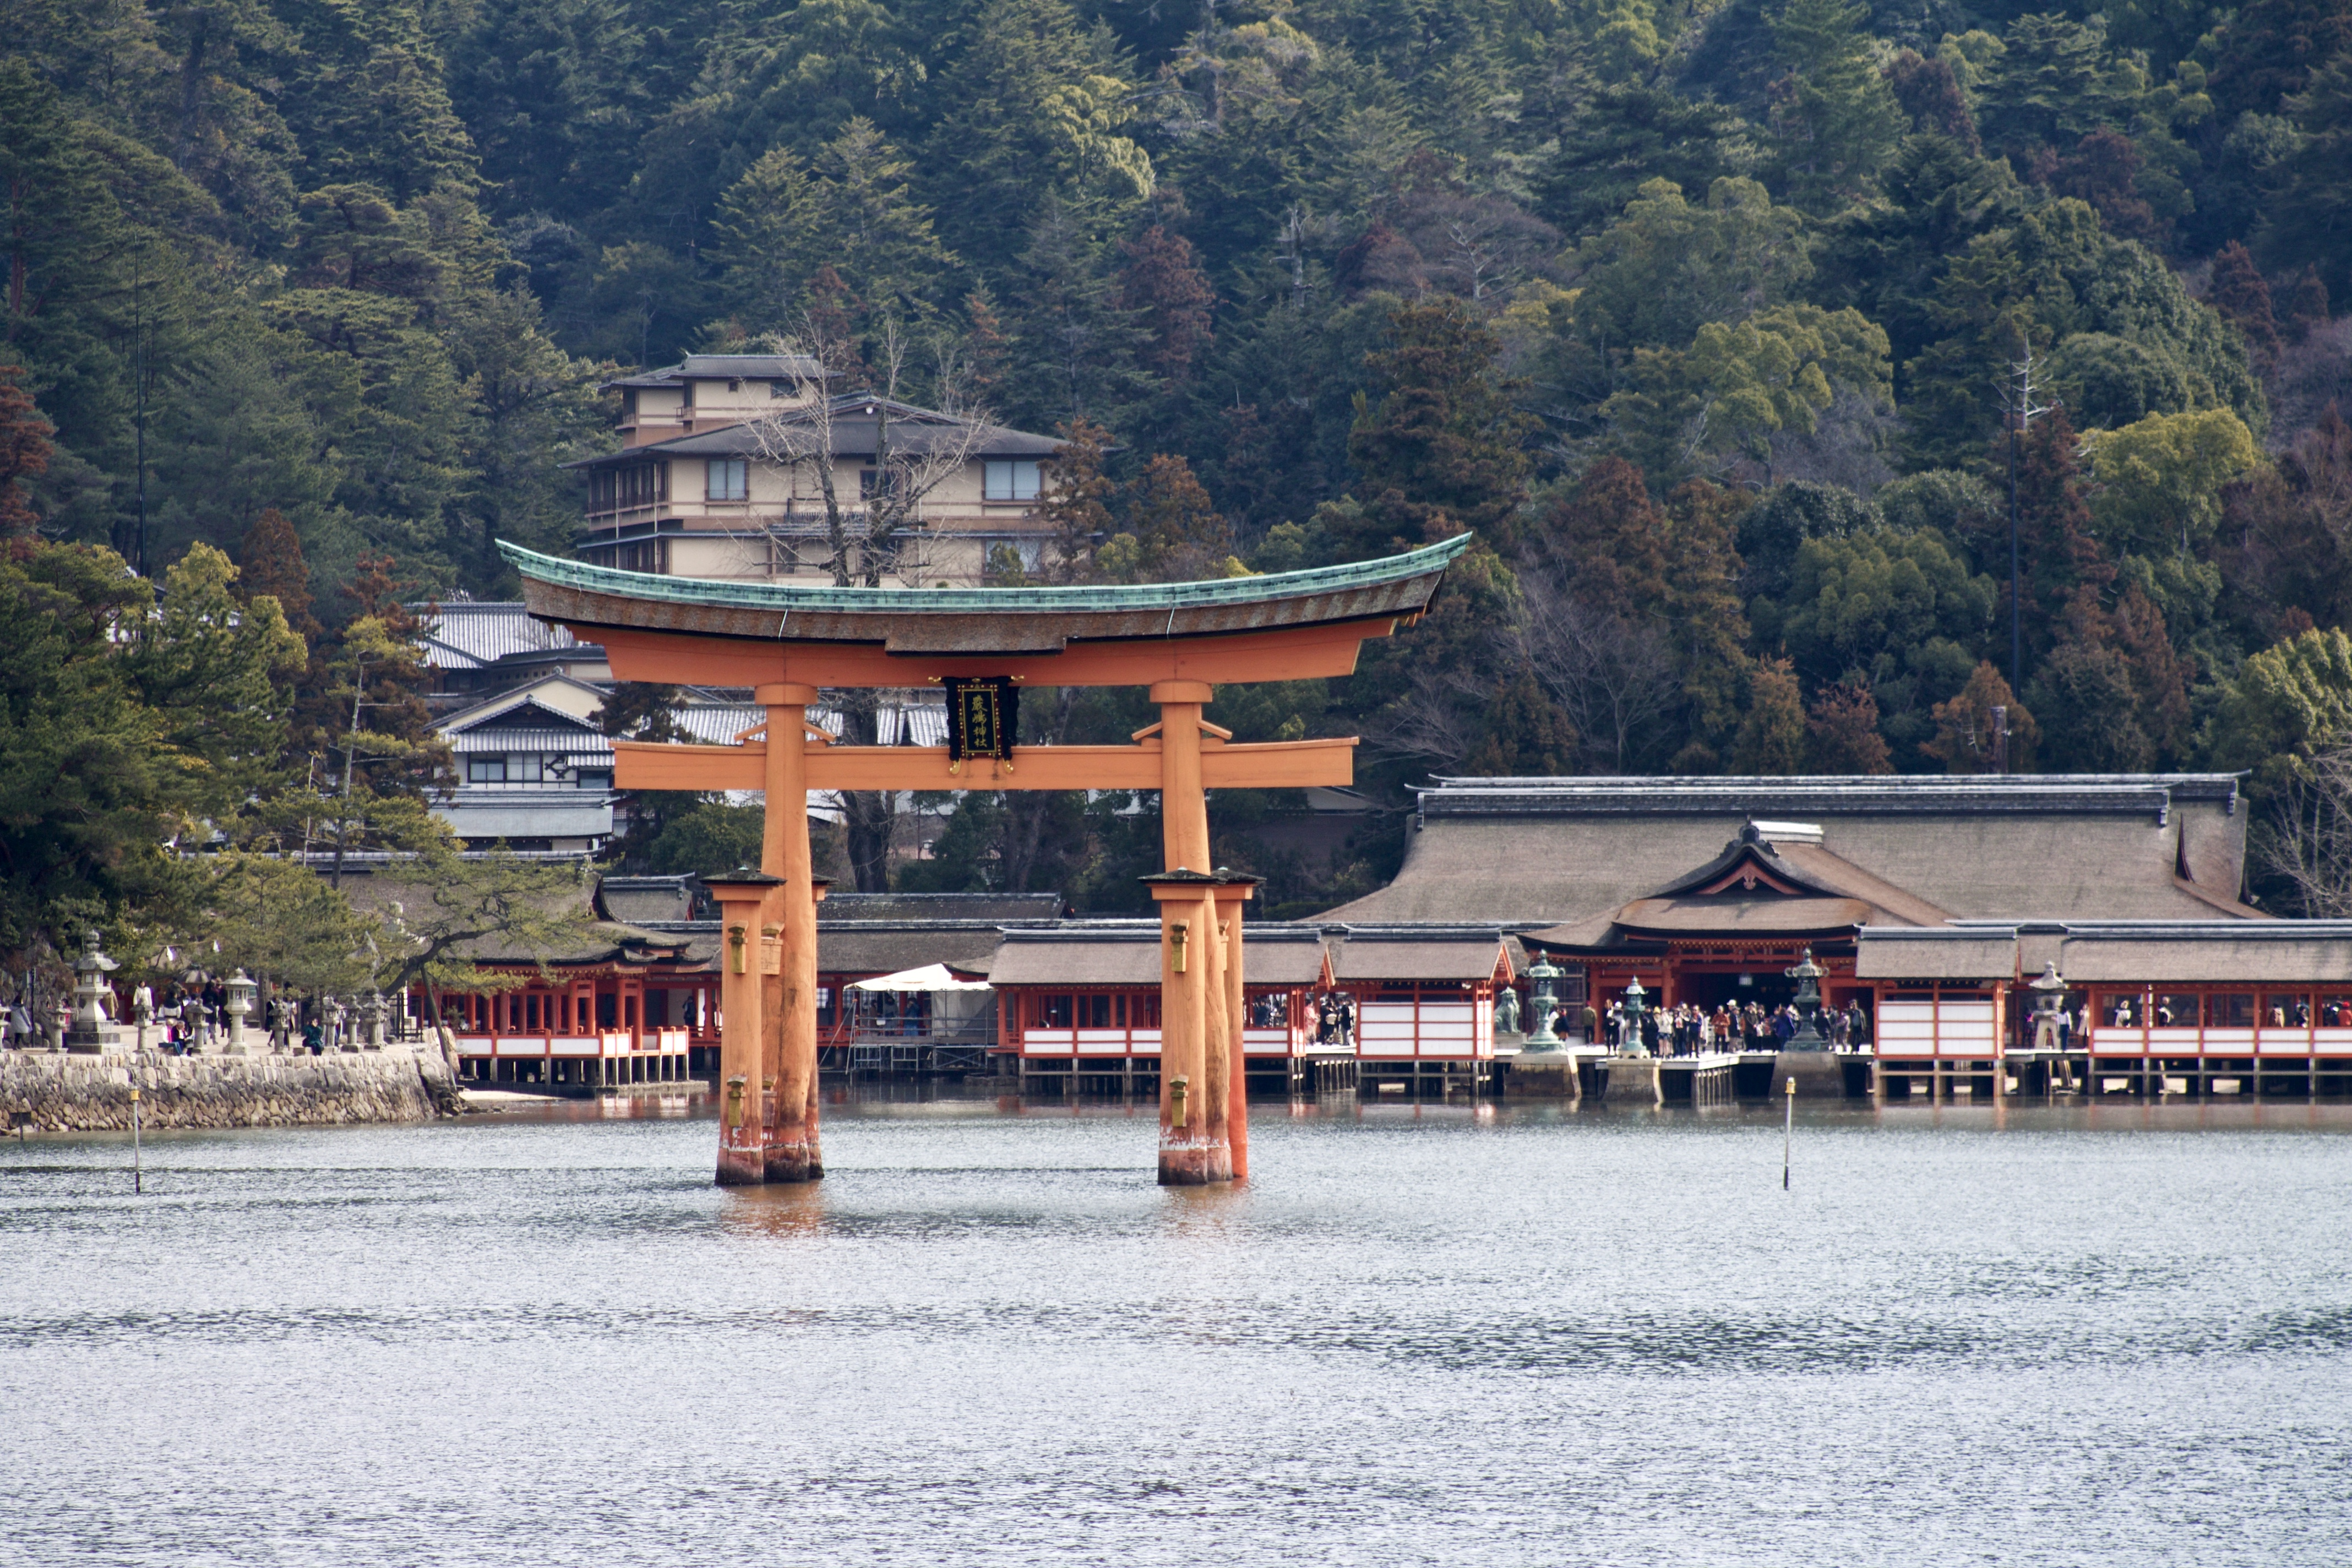 miyajime torii and temple